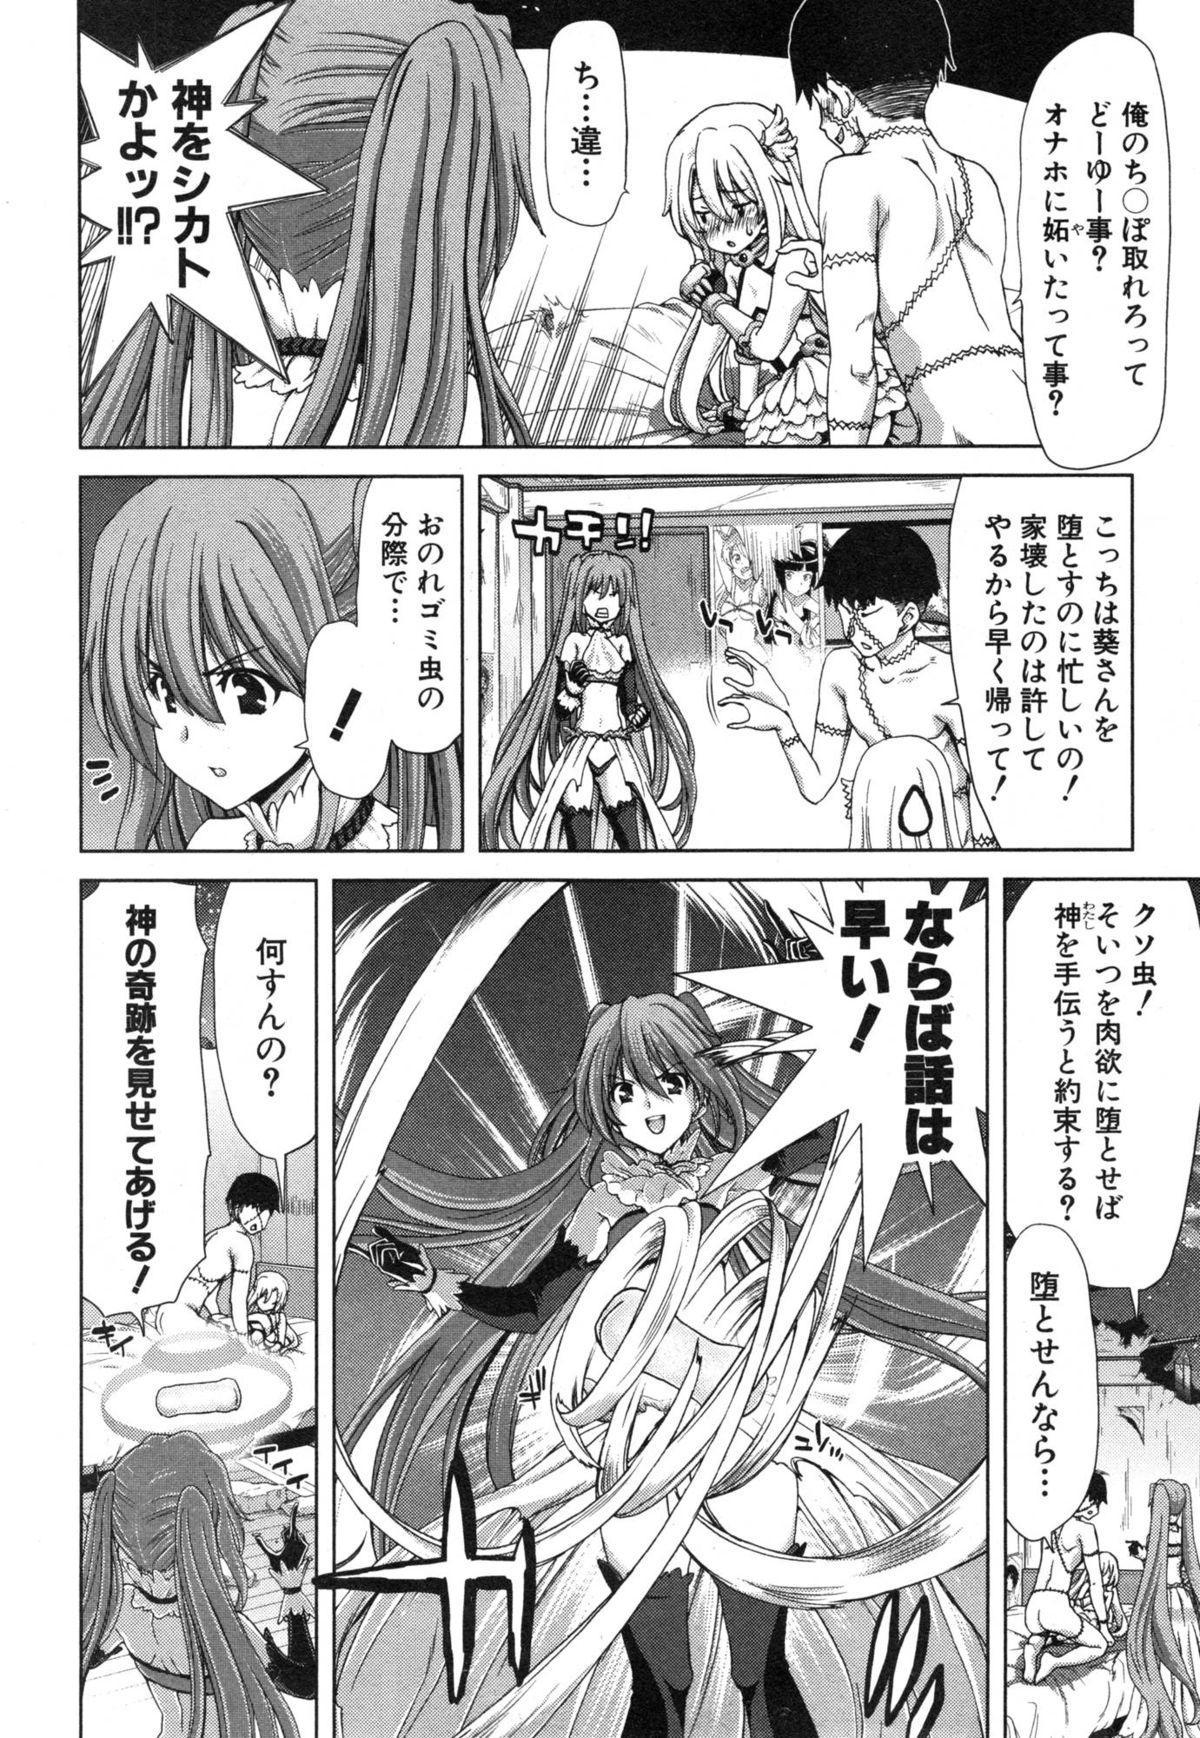 COMIC Shingeki 2015-01 217